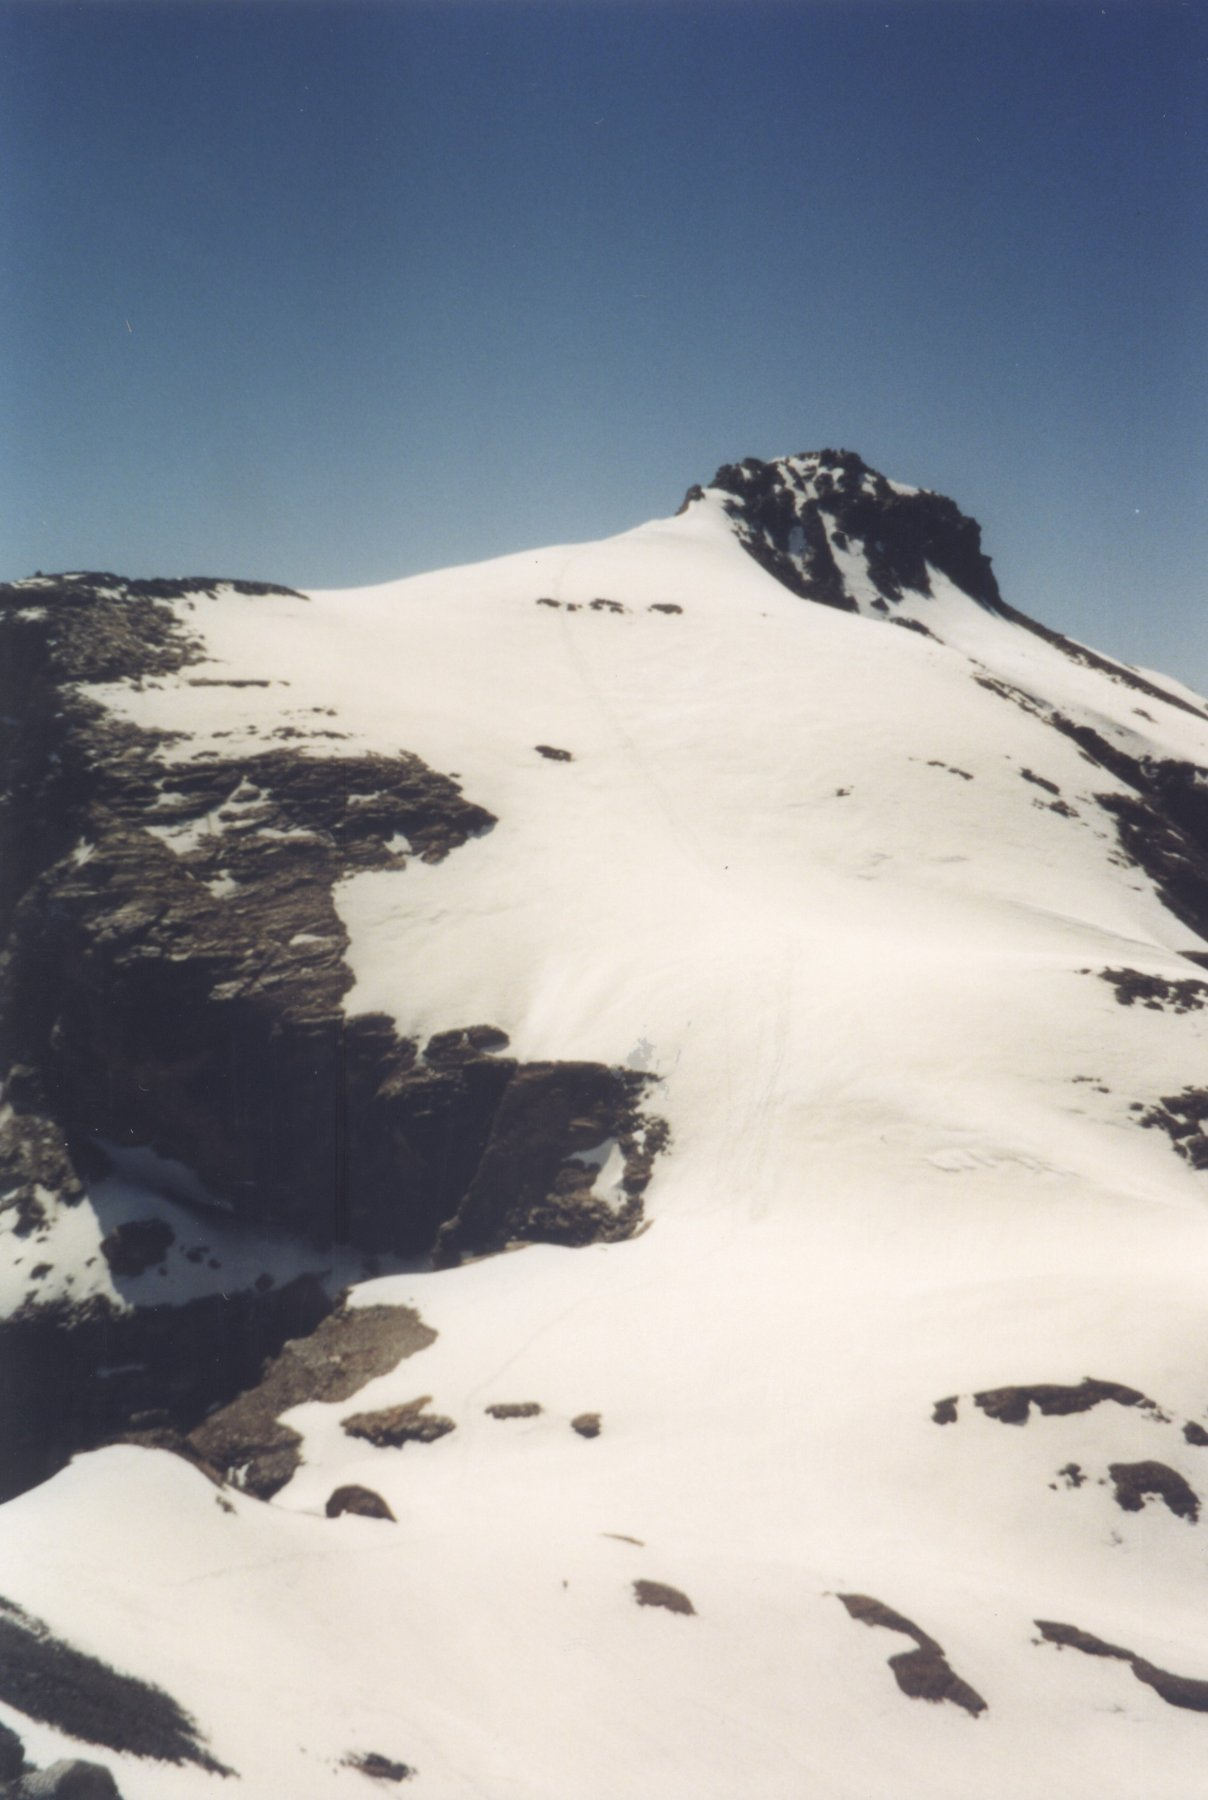 monte Cervandone in discesa